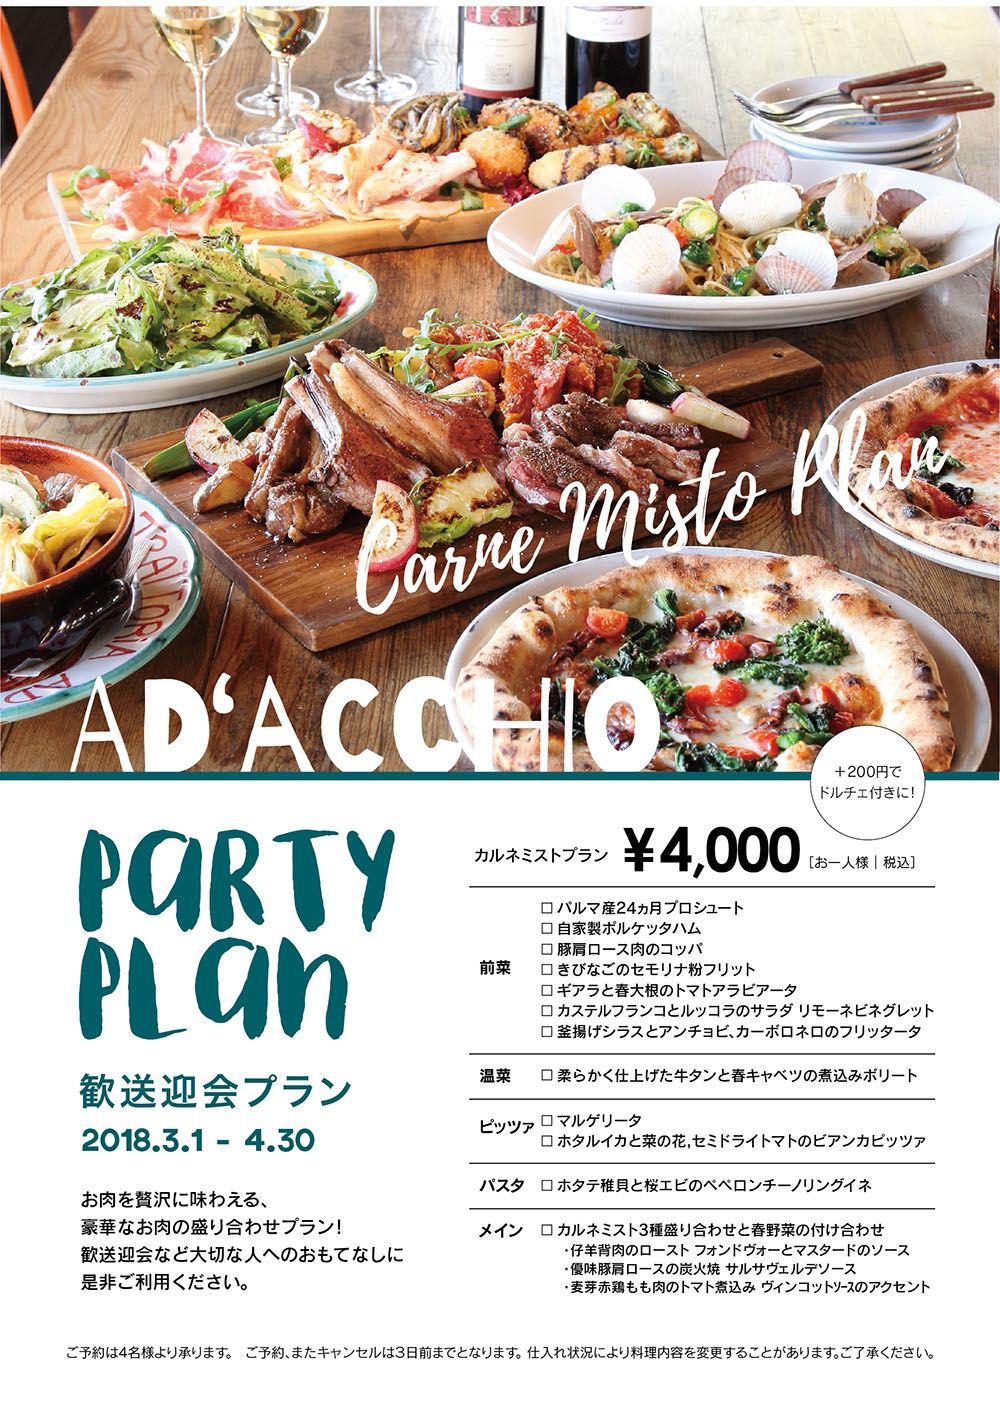 adc_180221_歓送迎会-01.jpg